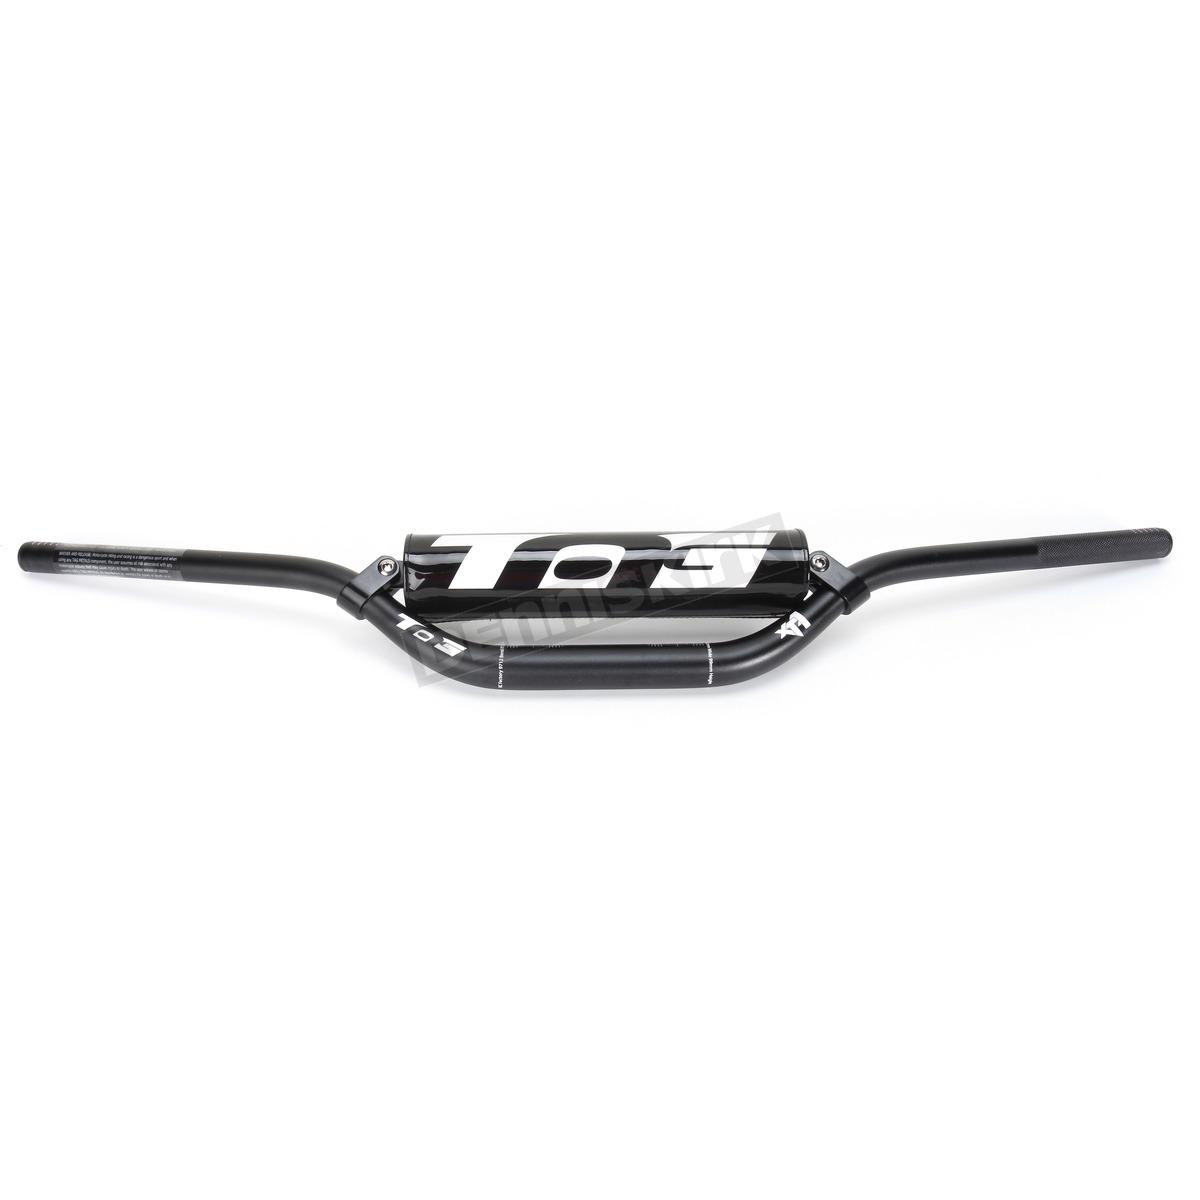 Tag Metals Black Xt1 Handlebar W Elastomer Insert Anti Vibration W Honda Kawasaki Rc Factory